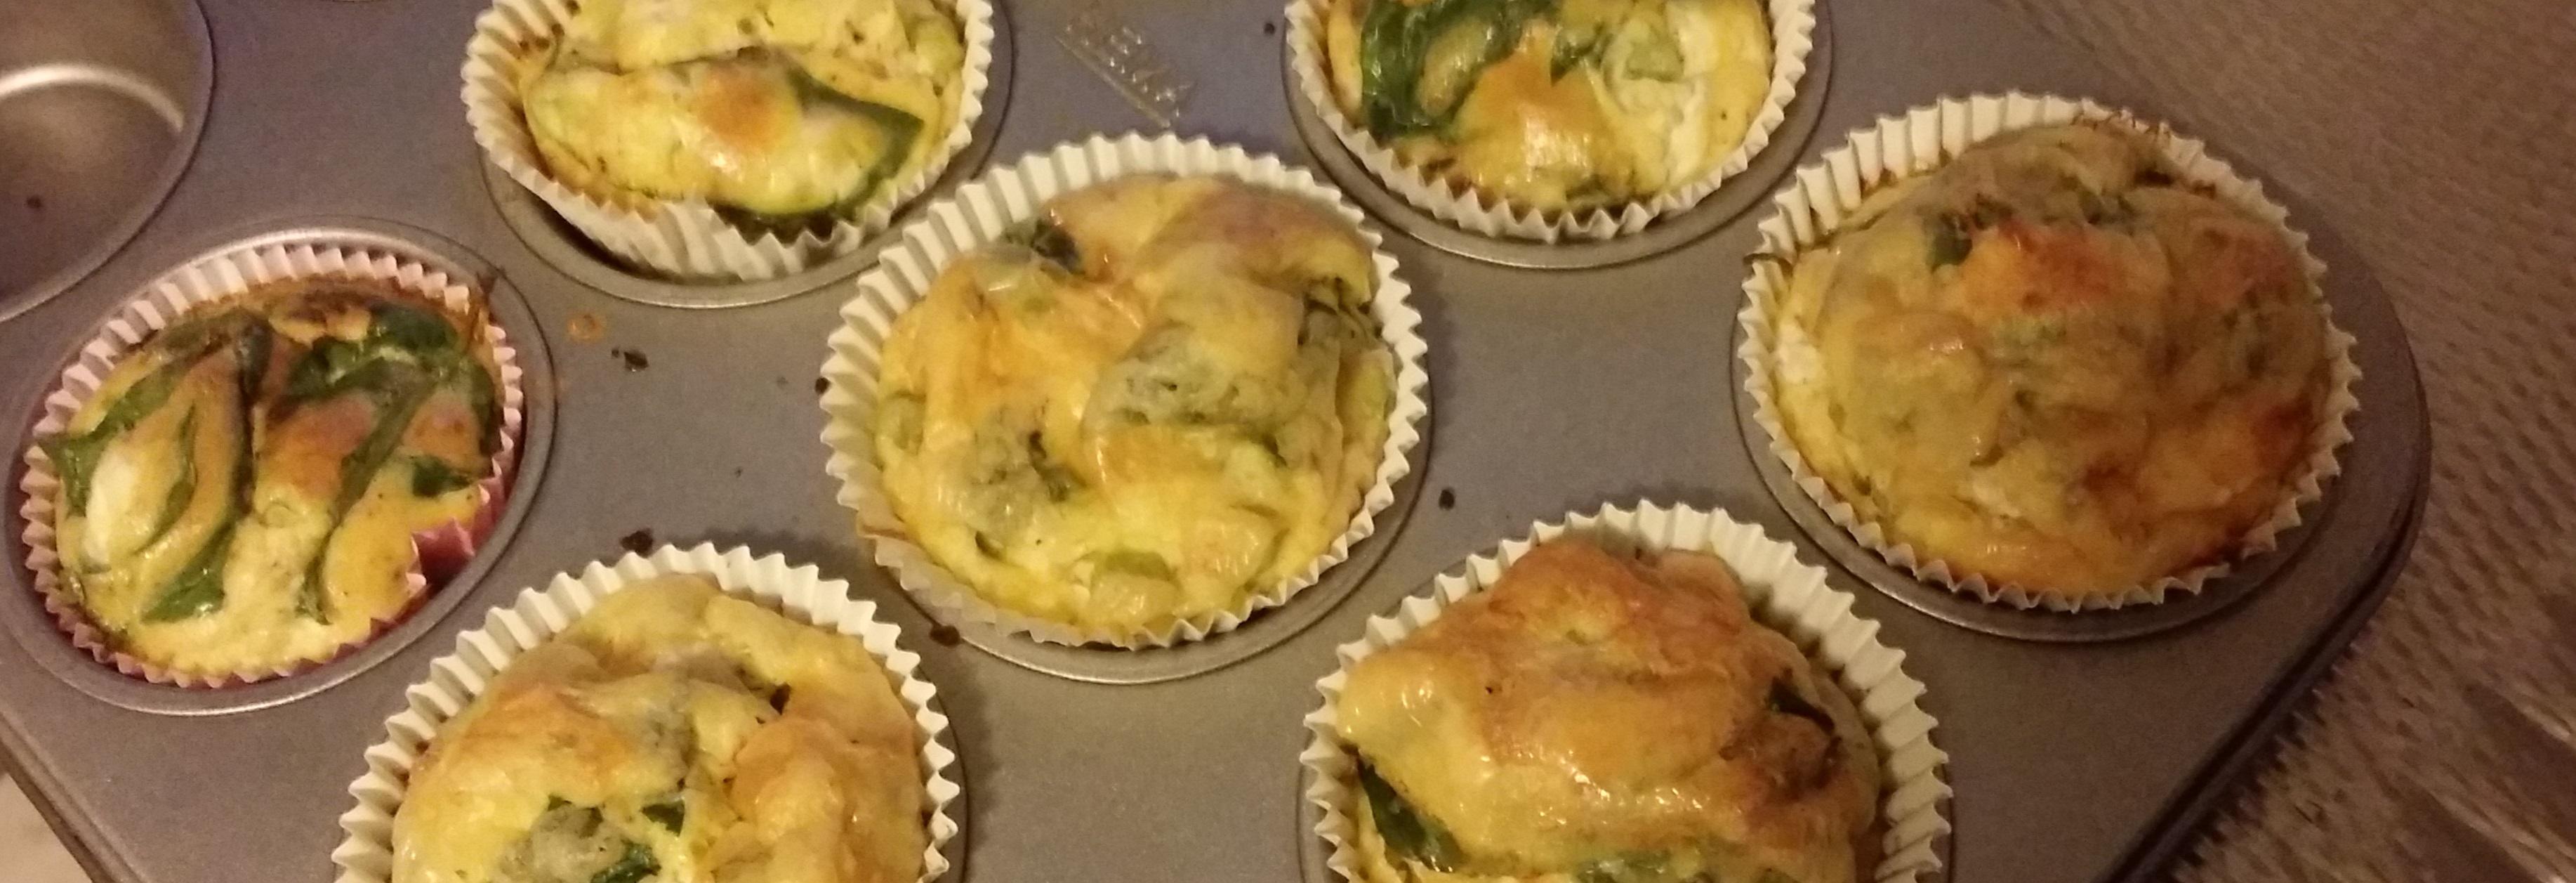 Gezonde ei muffins - eetdagboek Cynthia